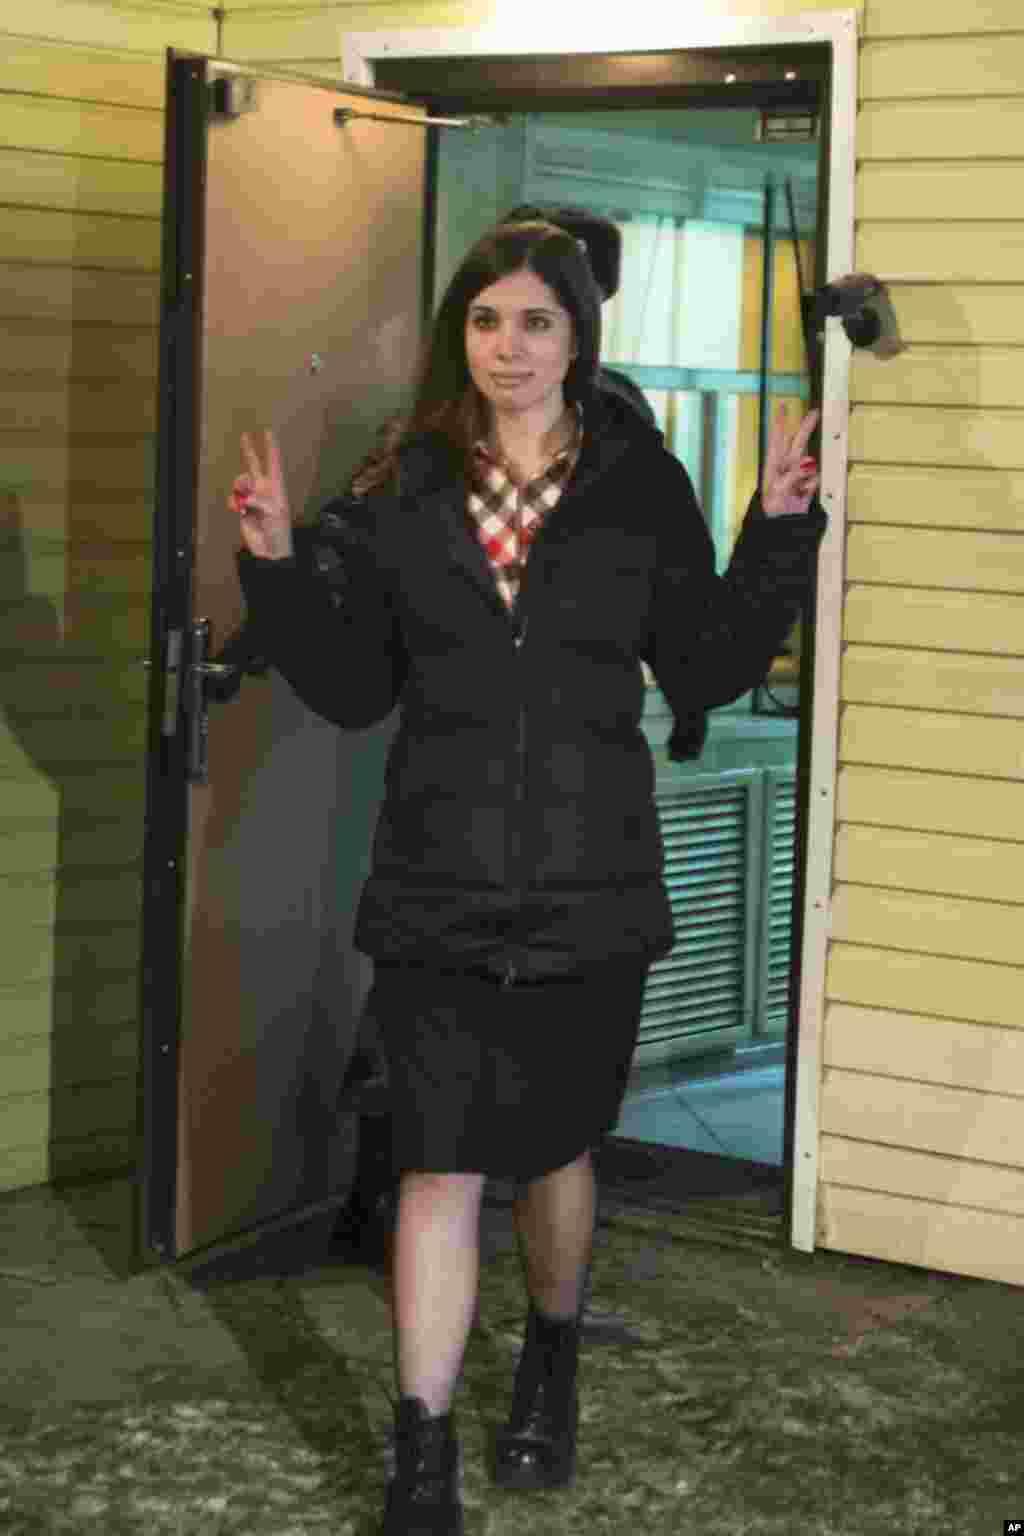 Nadezhda Tolokonnikova mengacungkan jari tanda damai saat ia meningalkan penjara di Krasnoyarsk, Rusia, Senin (23/12). (AP/Tatyana Vishnevskaya)